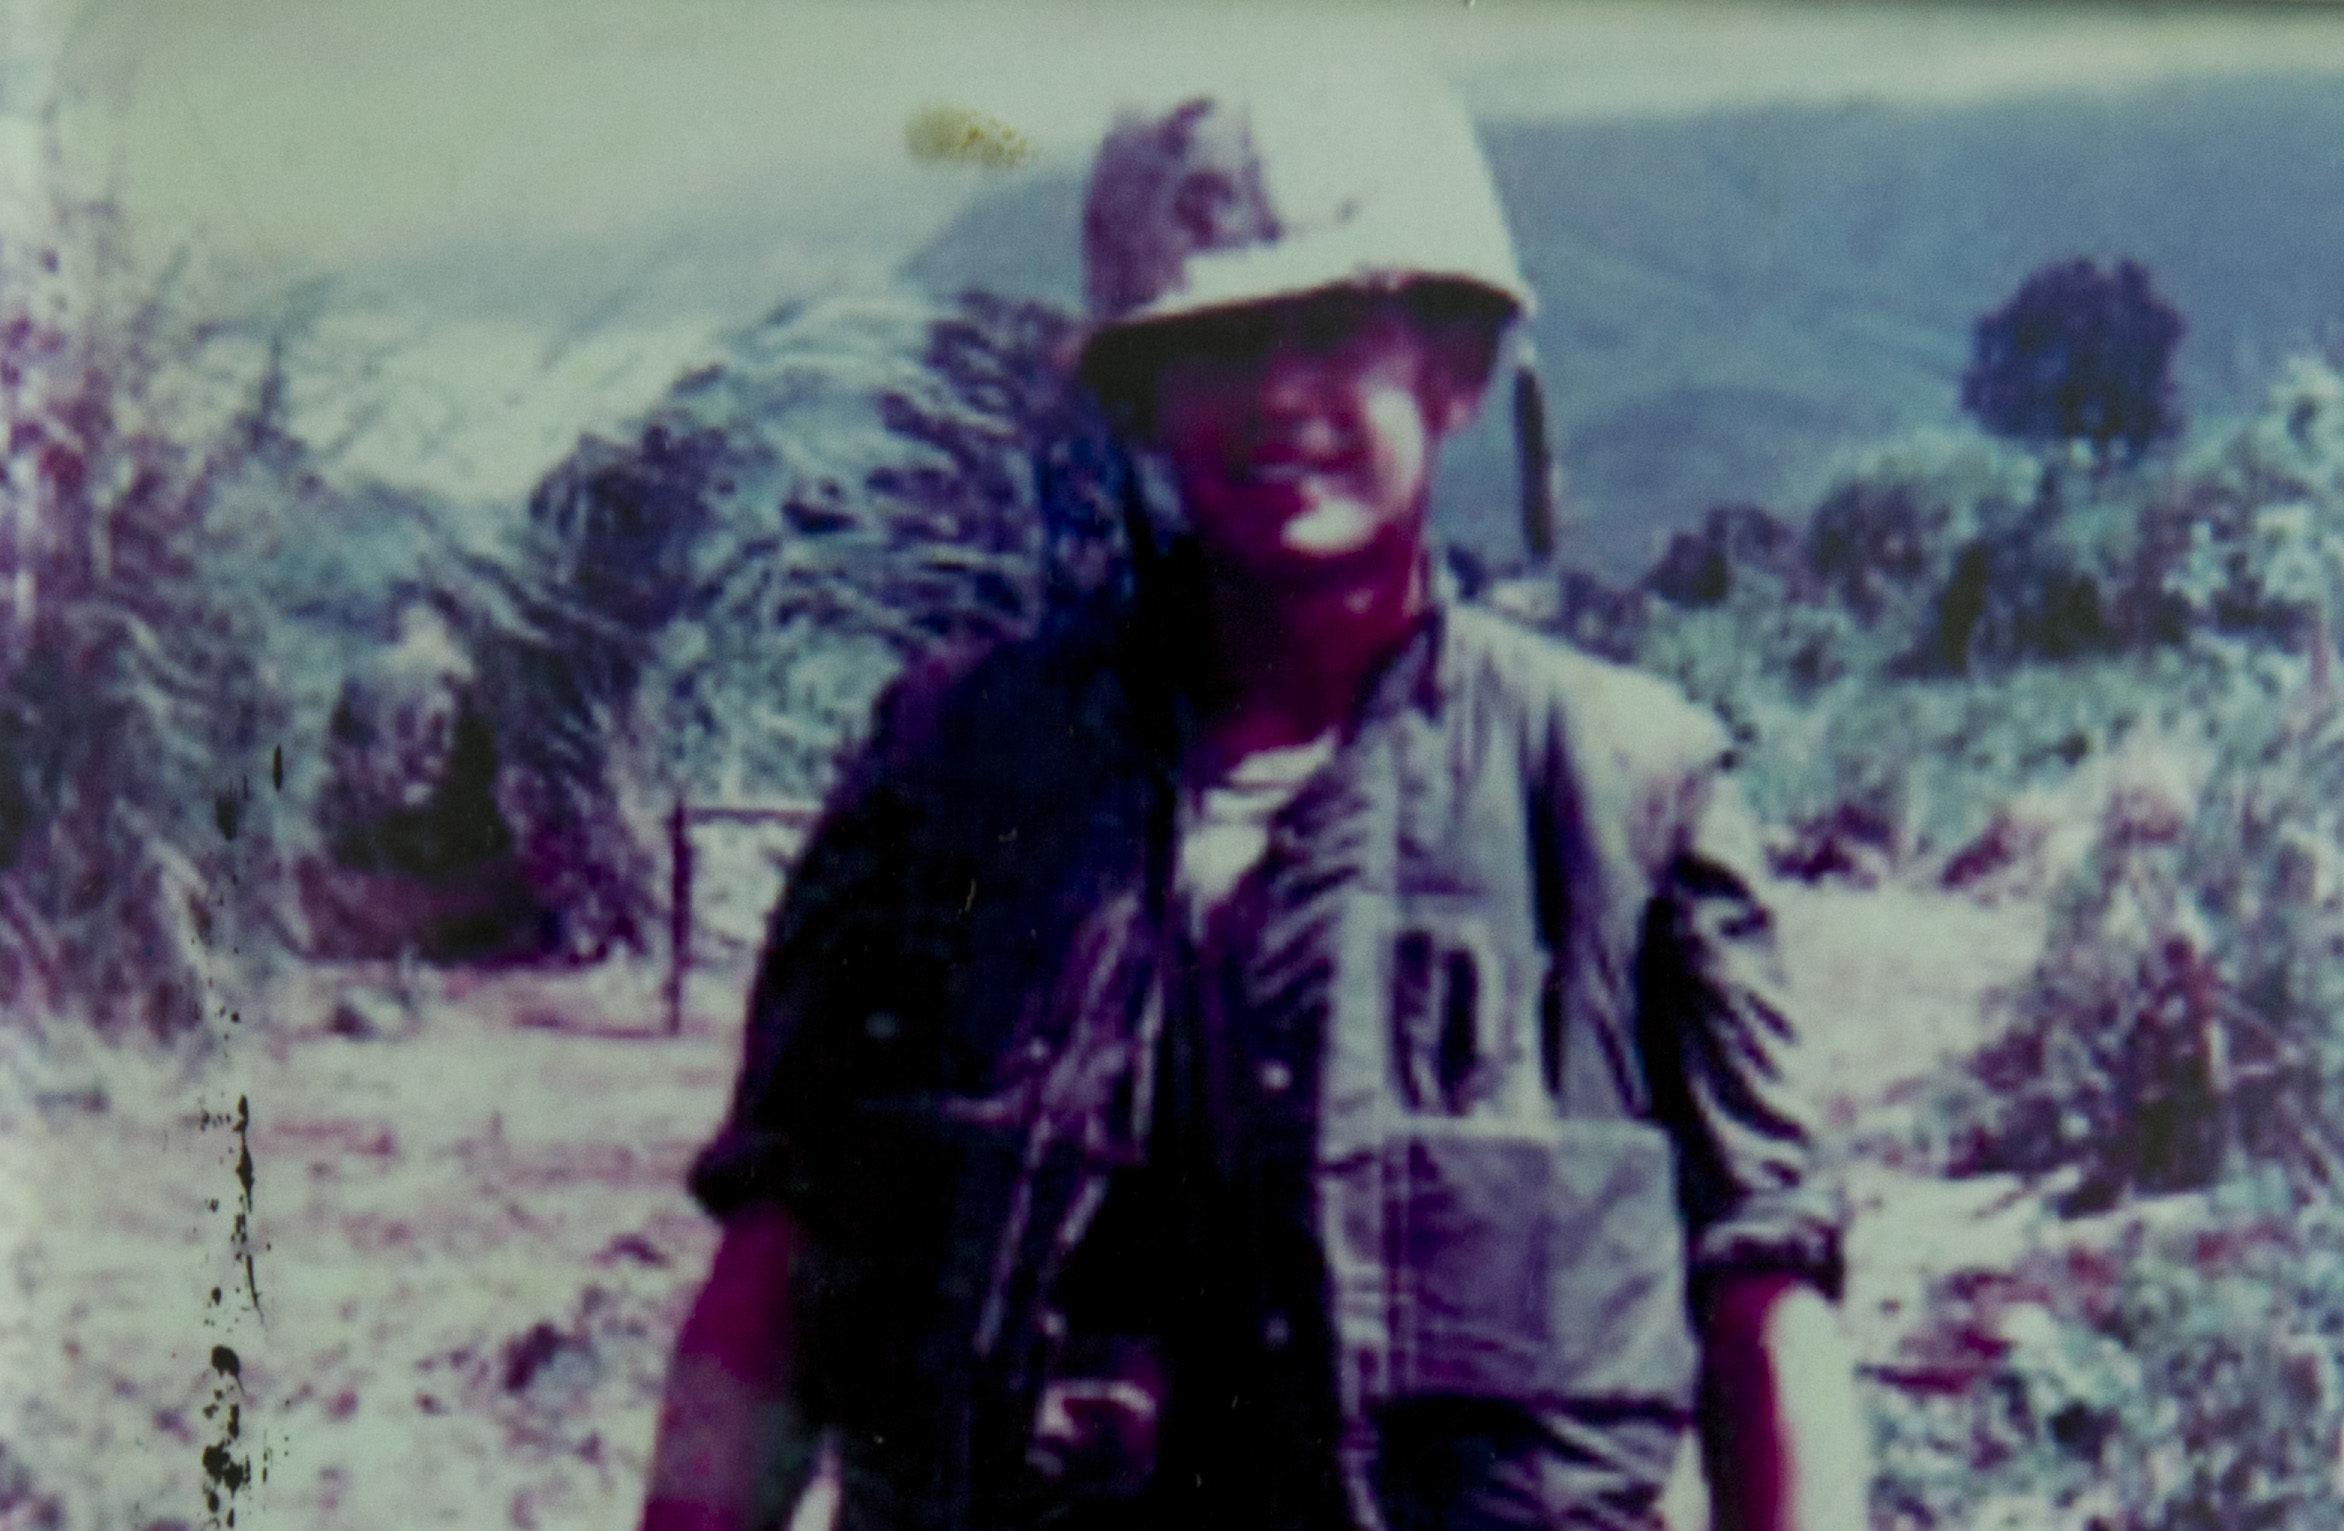 Scot Alexander Chisholm in Vietnam.